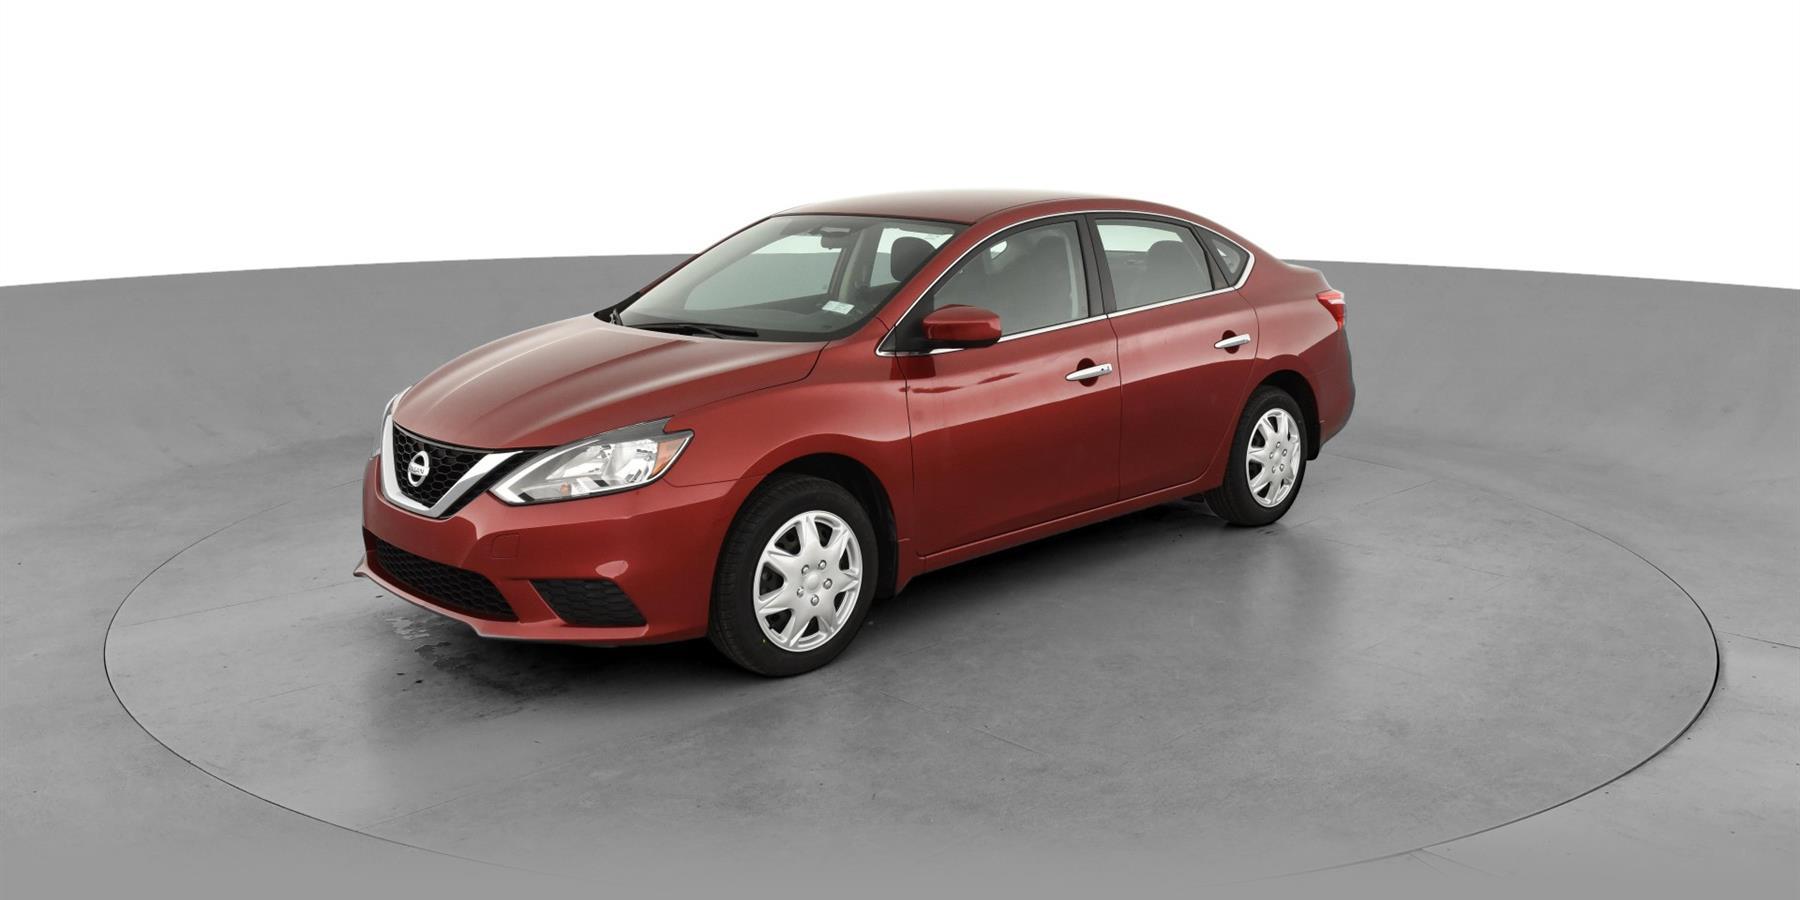 Carvana | Buy Used Cars Online & Skip The Dealership